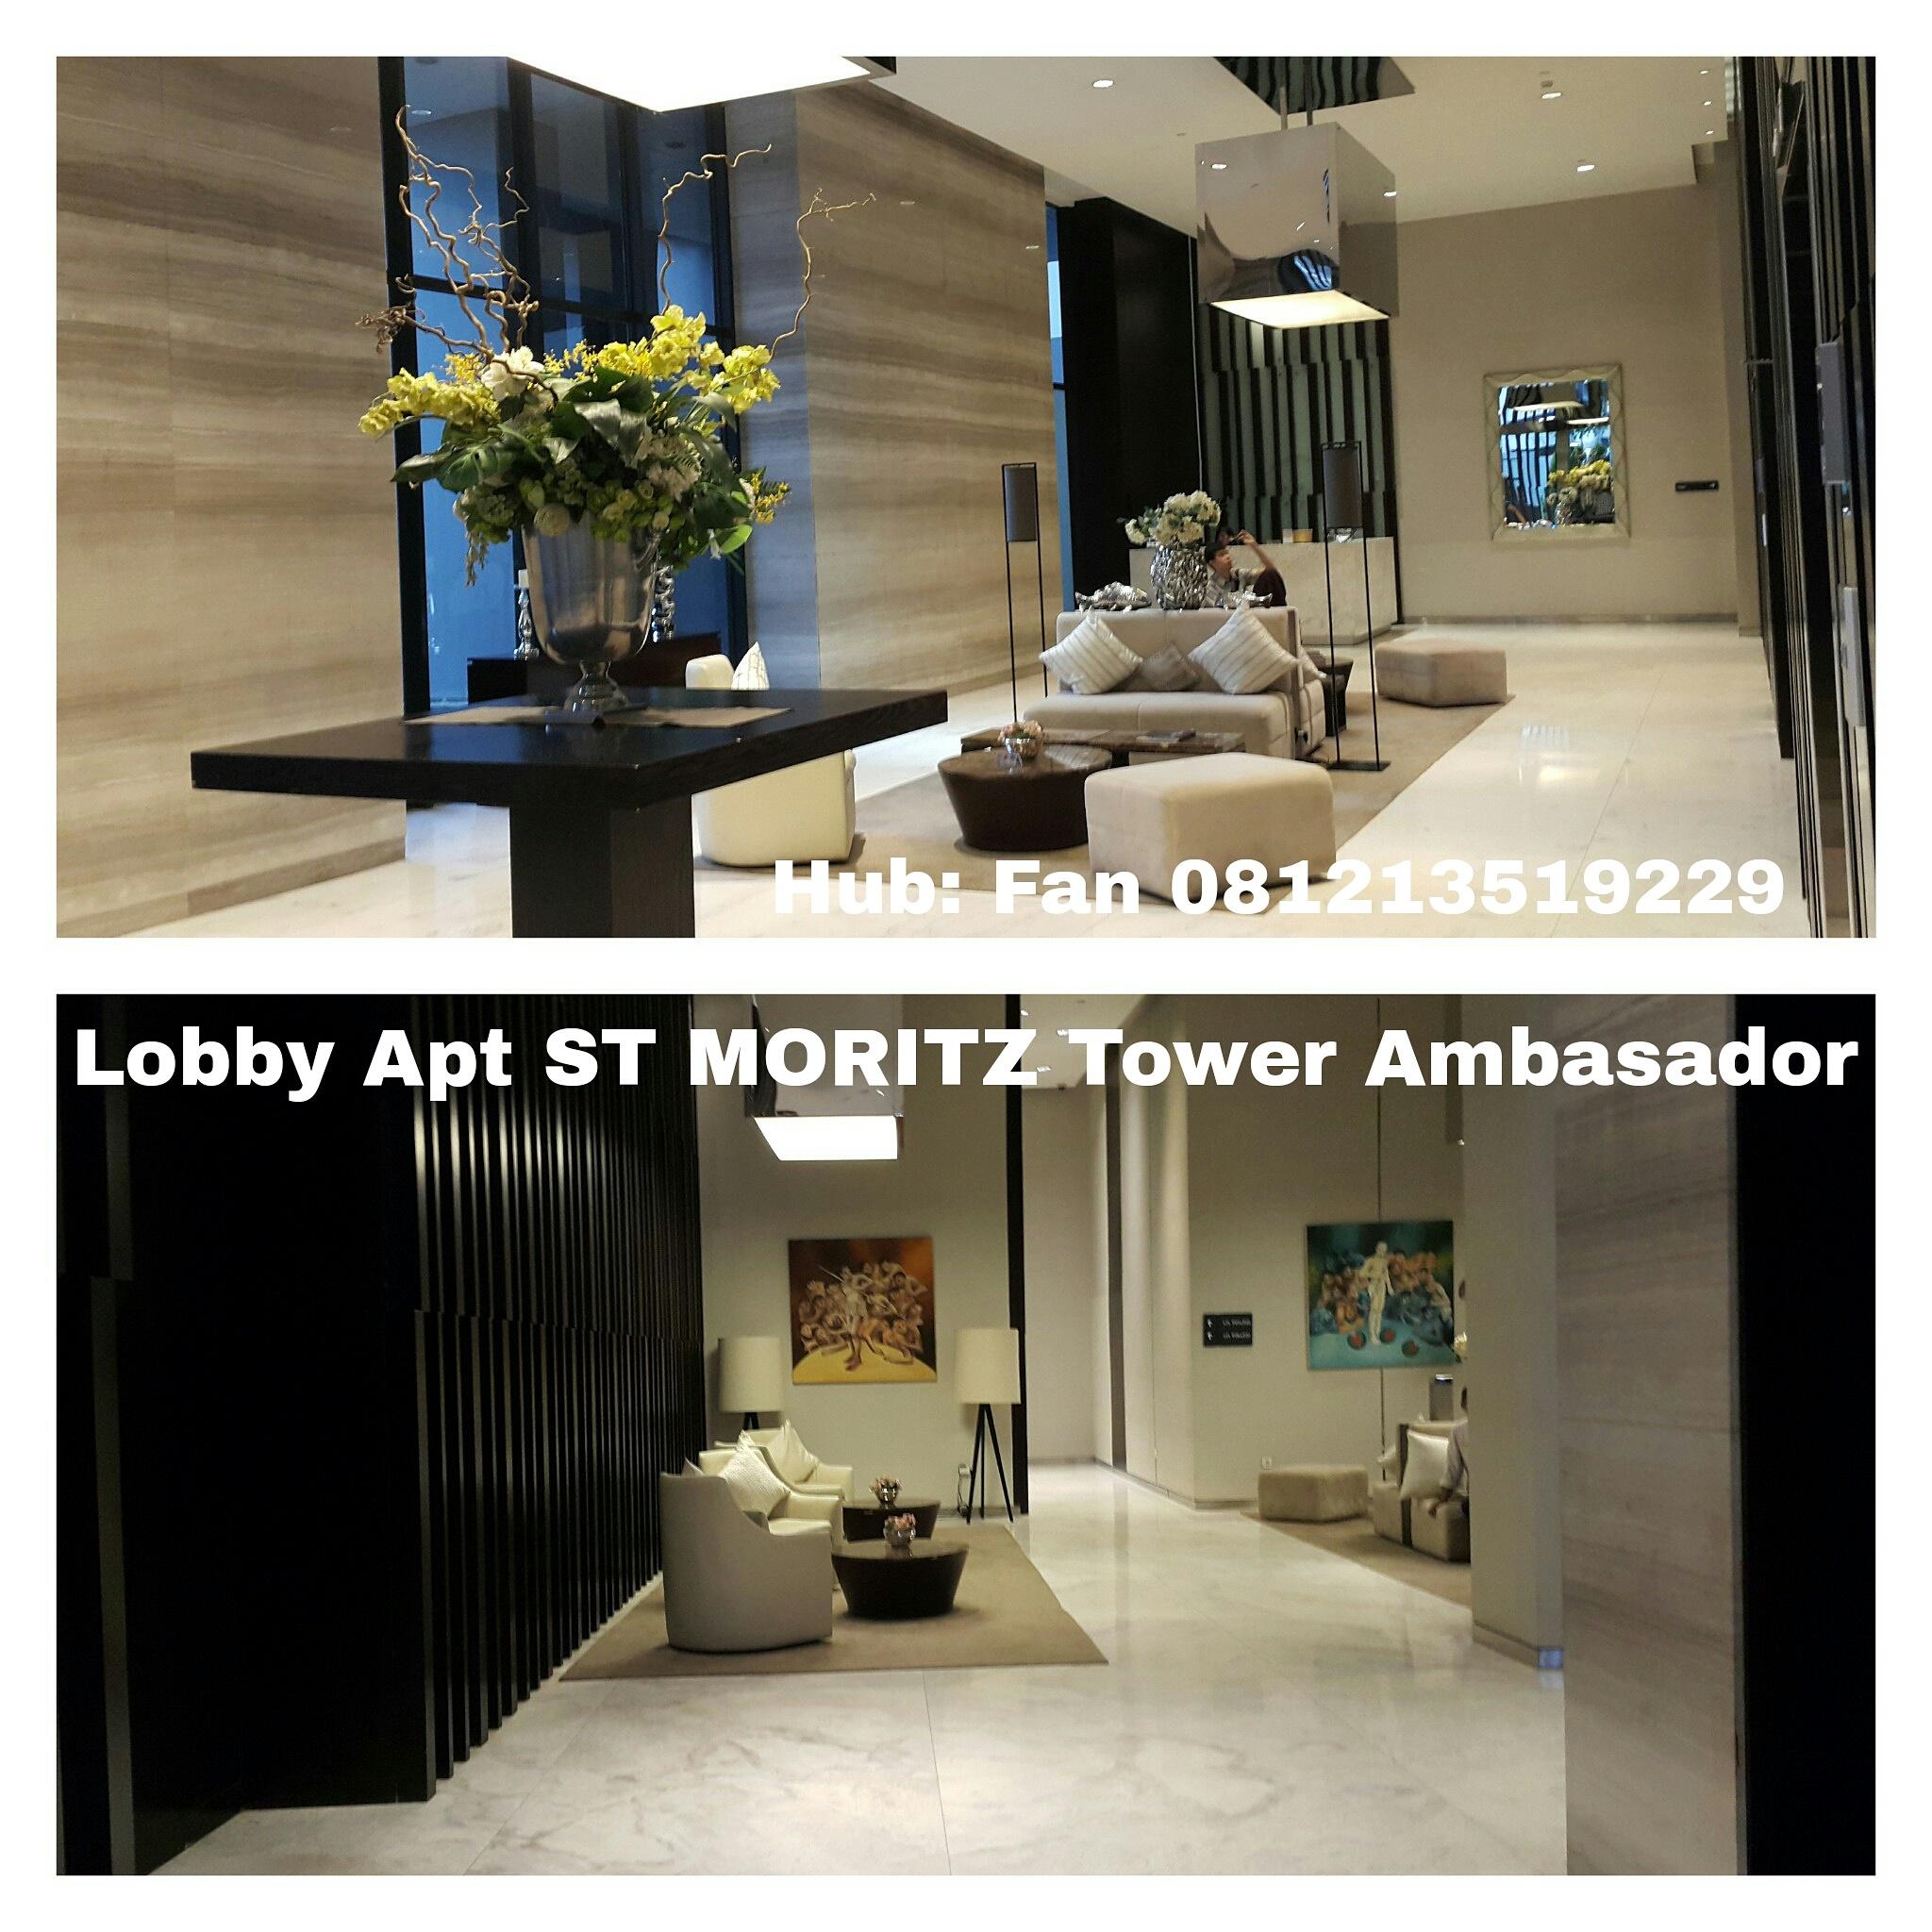 Lobby ambasador st moritz.jpg